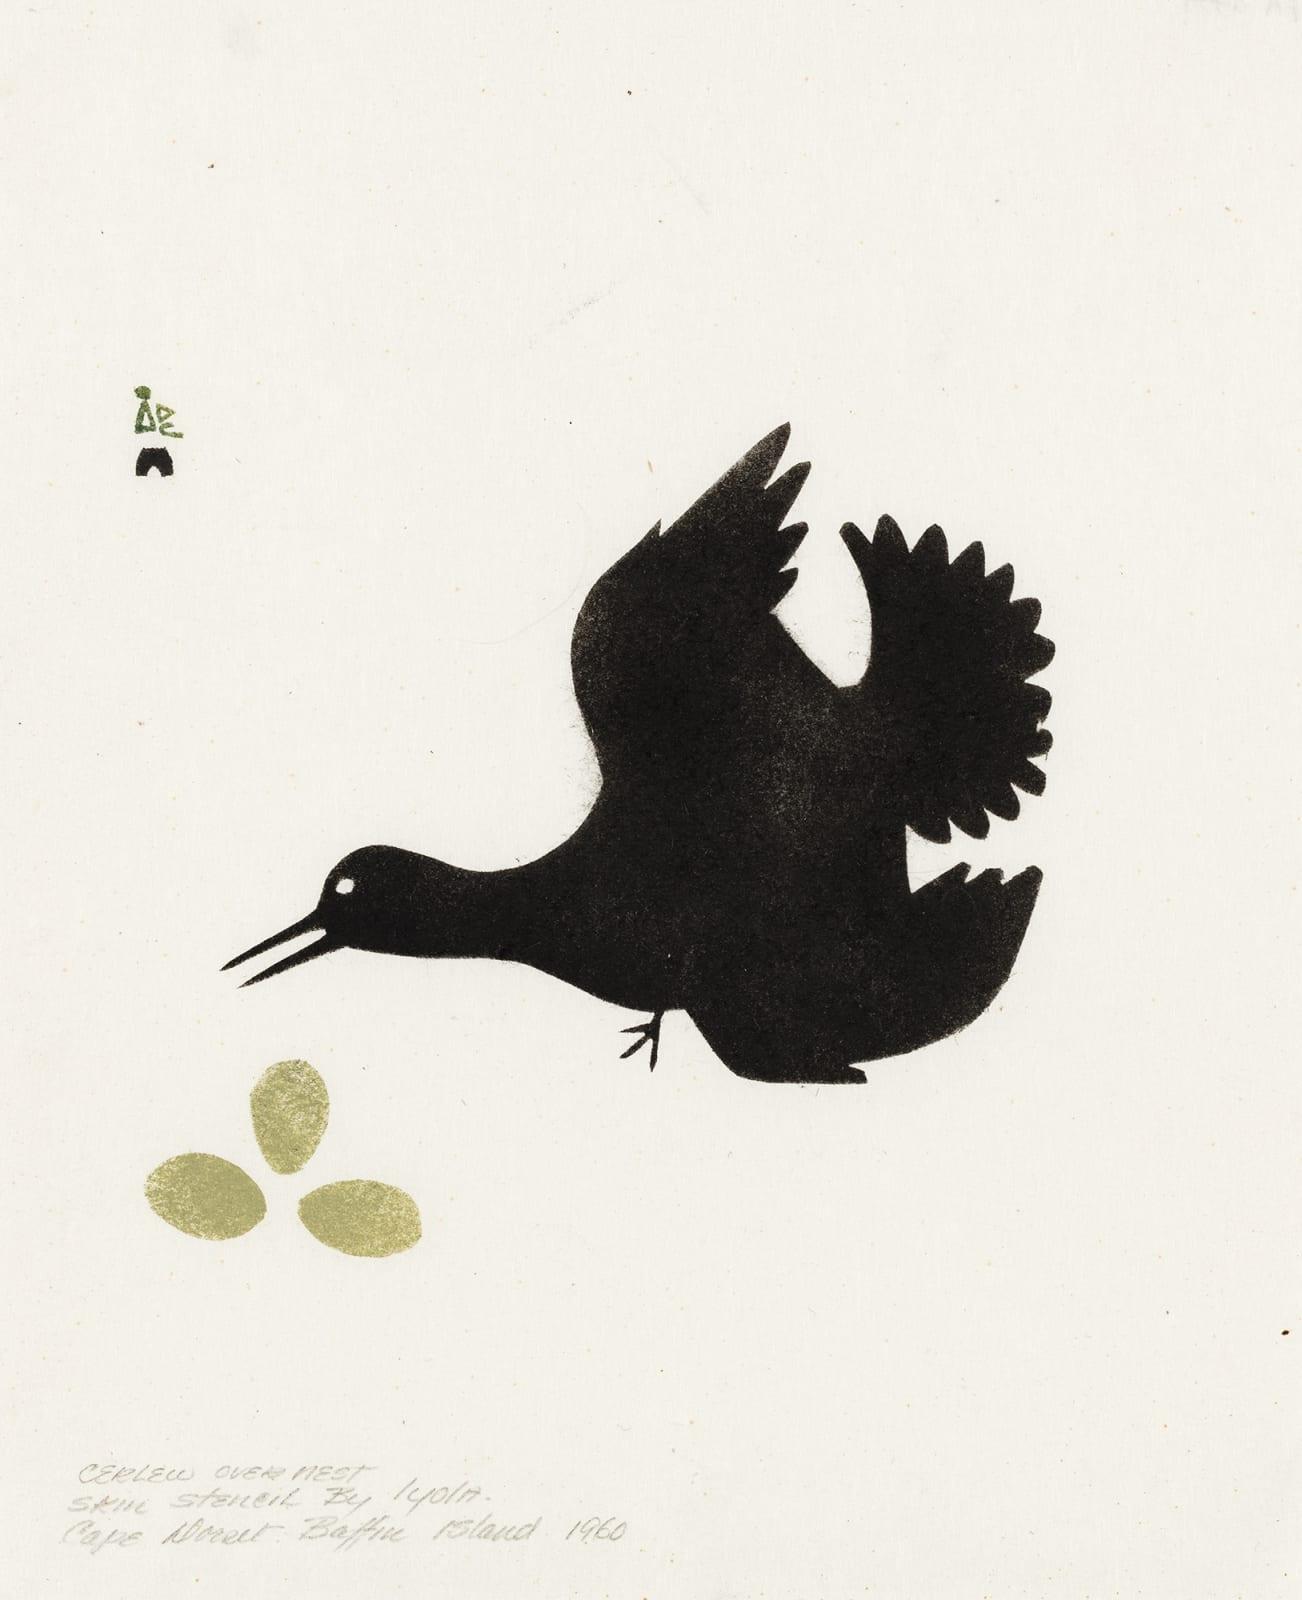 Lot 104 IYOLA KINGWATSIAK (1933-2000) m., KINNGAIT (CAPE DORSET) Curlew Over Nest*, 1960 sealskin stencil, 10.5 x 8.5 in (26.7 x 21.6 cm). Estimate: $2,000— $3,000